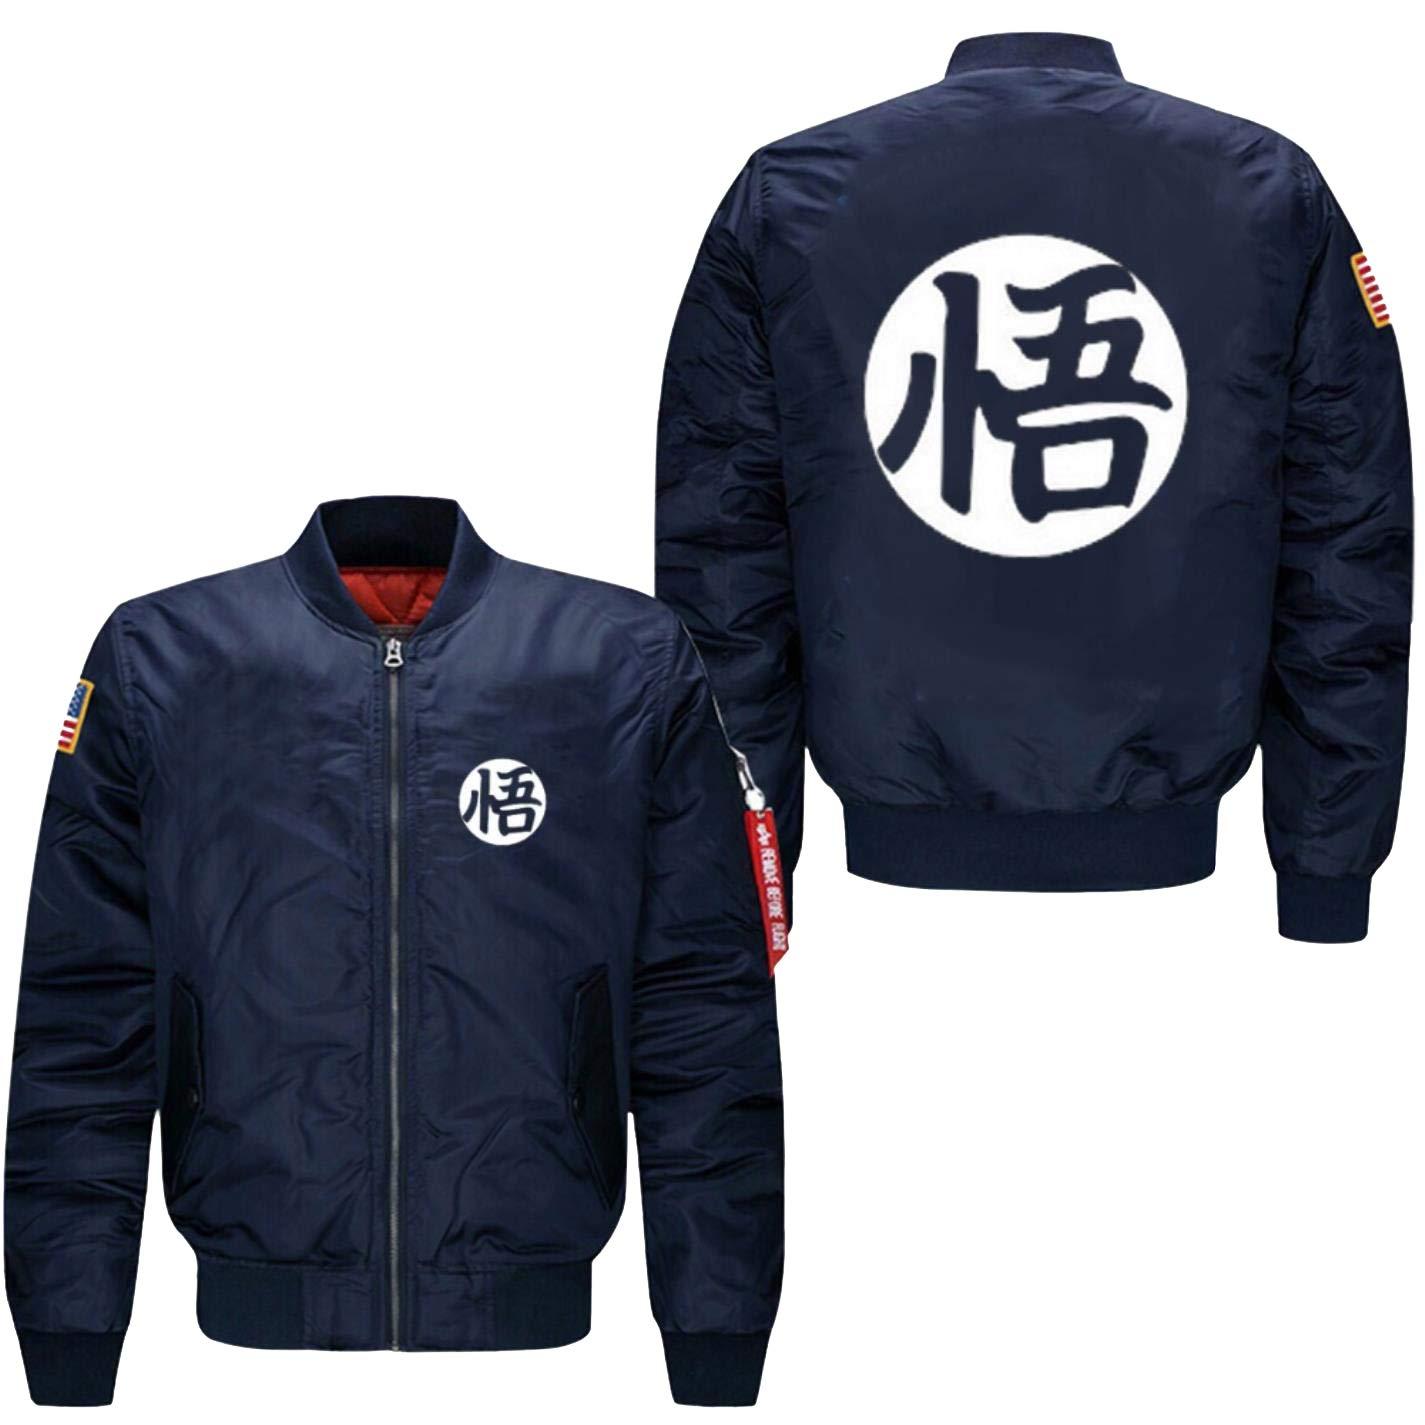 Men bomber flight jacket anime dragon ball cartoon goku sun baseball coat at amazon mens clothing store